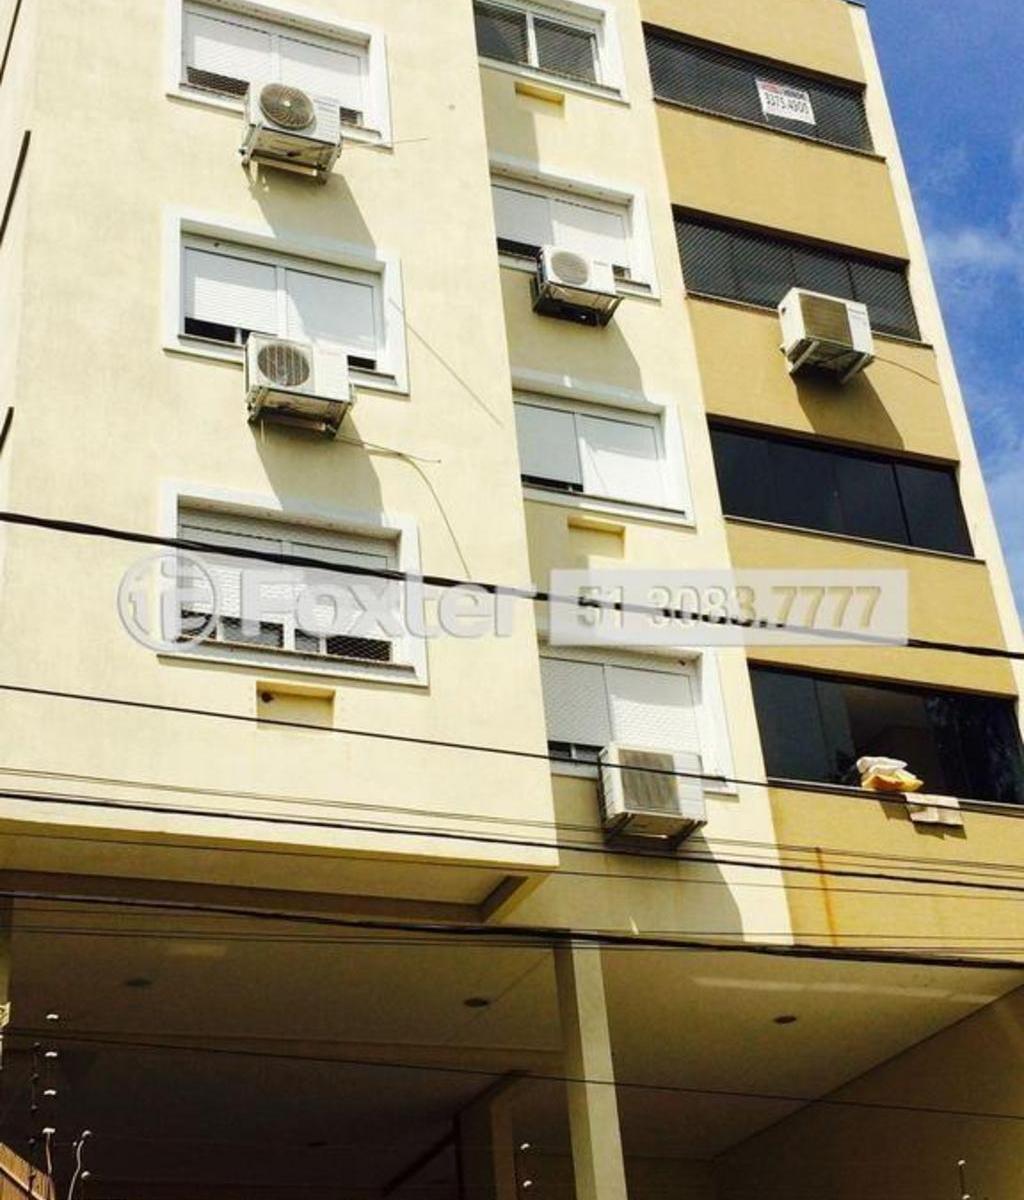 Development/6245/developmentPictures/fachada%20Carneiro.jpg